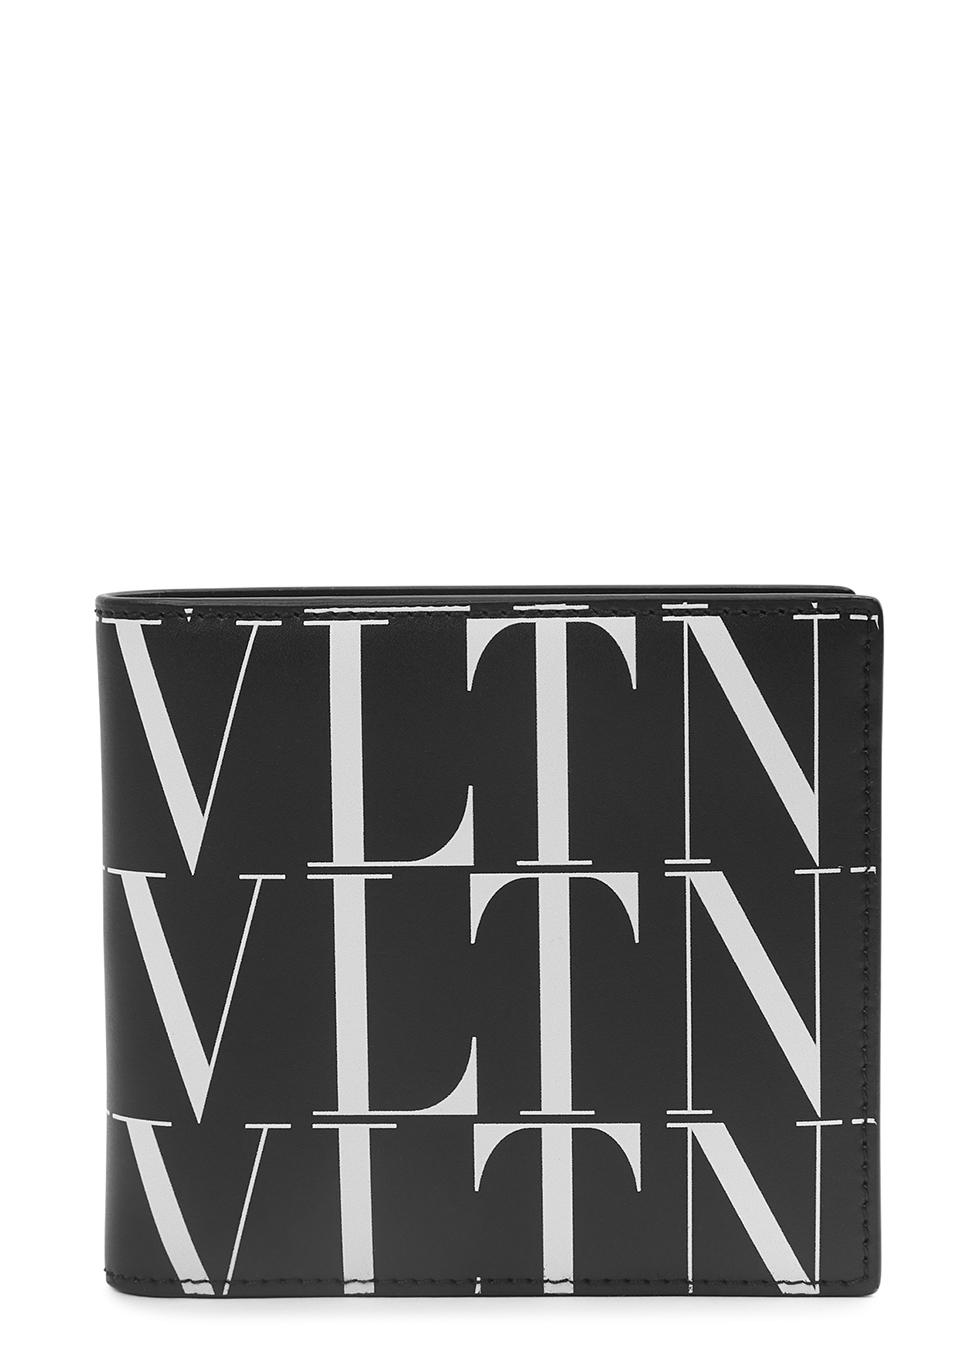 Valentino Garavani VLTN black leather wallet